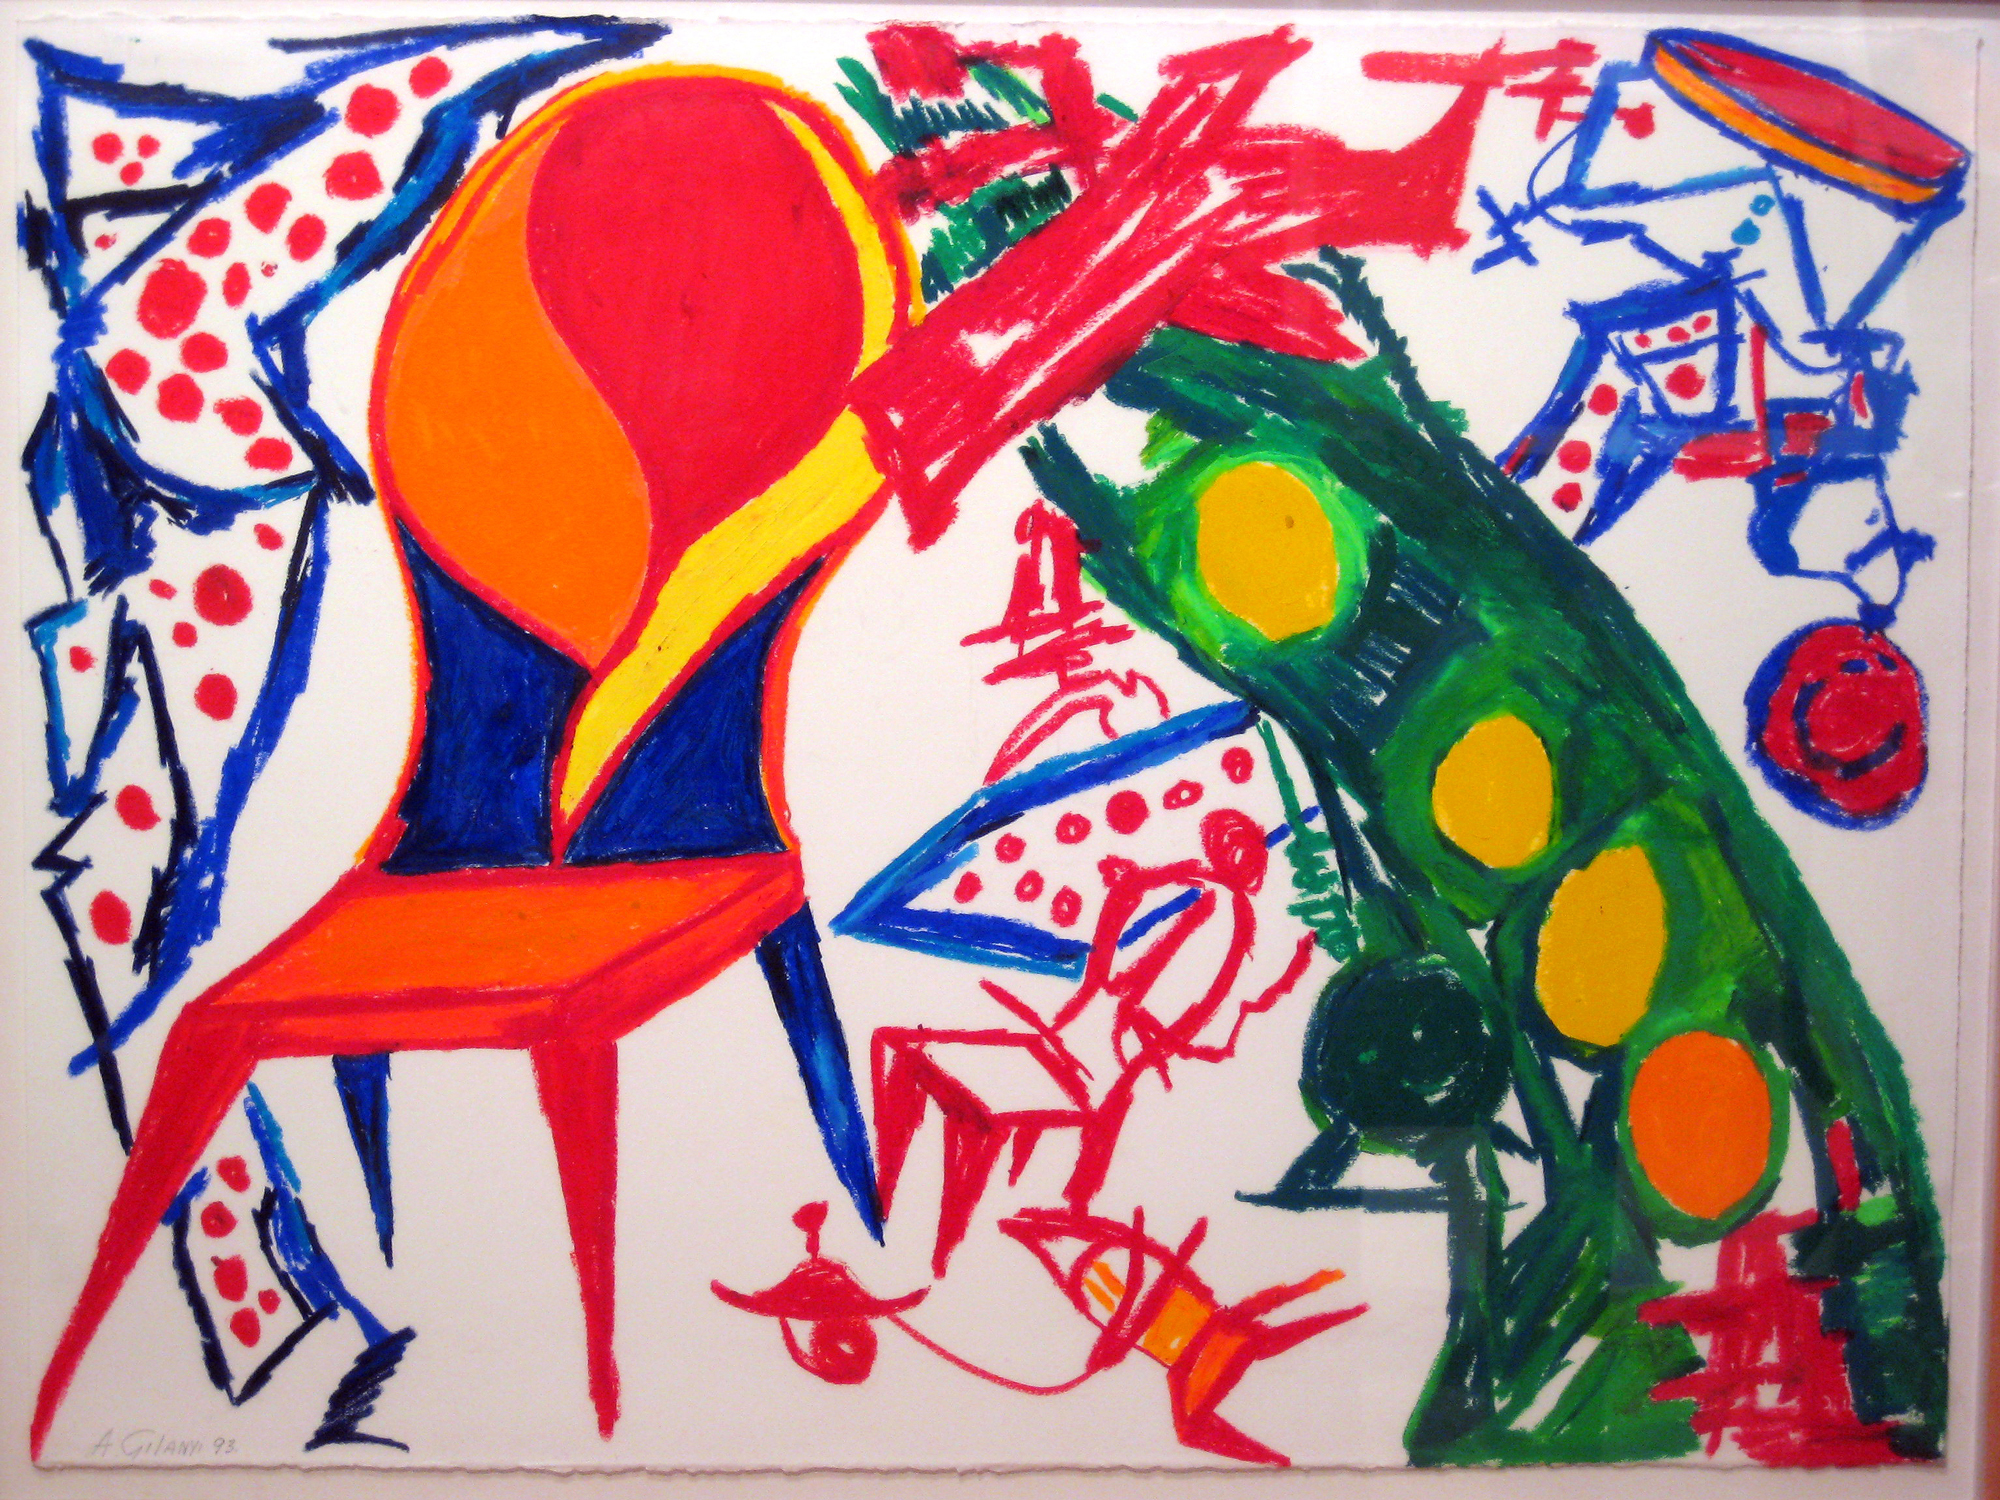 abstract surrealism drawing by Armand Gilanyi